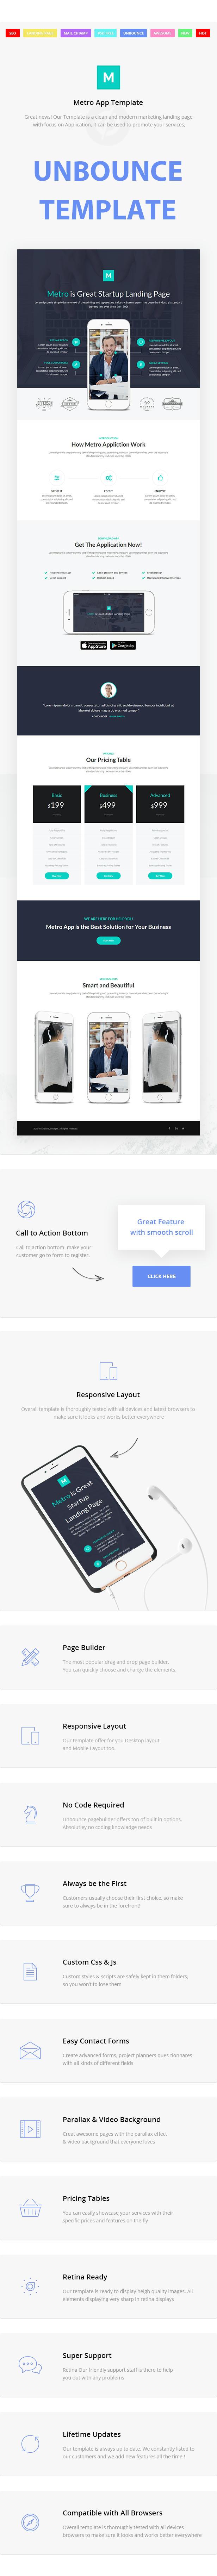 Metro App - Unbounce Landing Page - 1